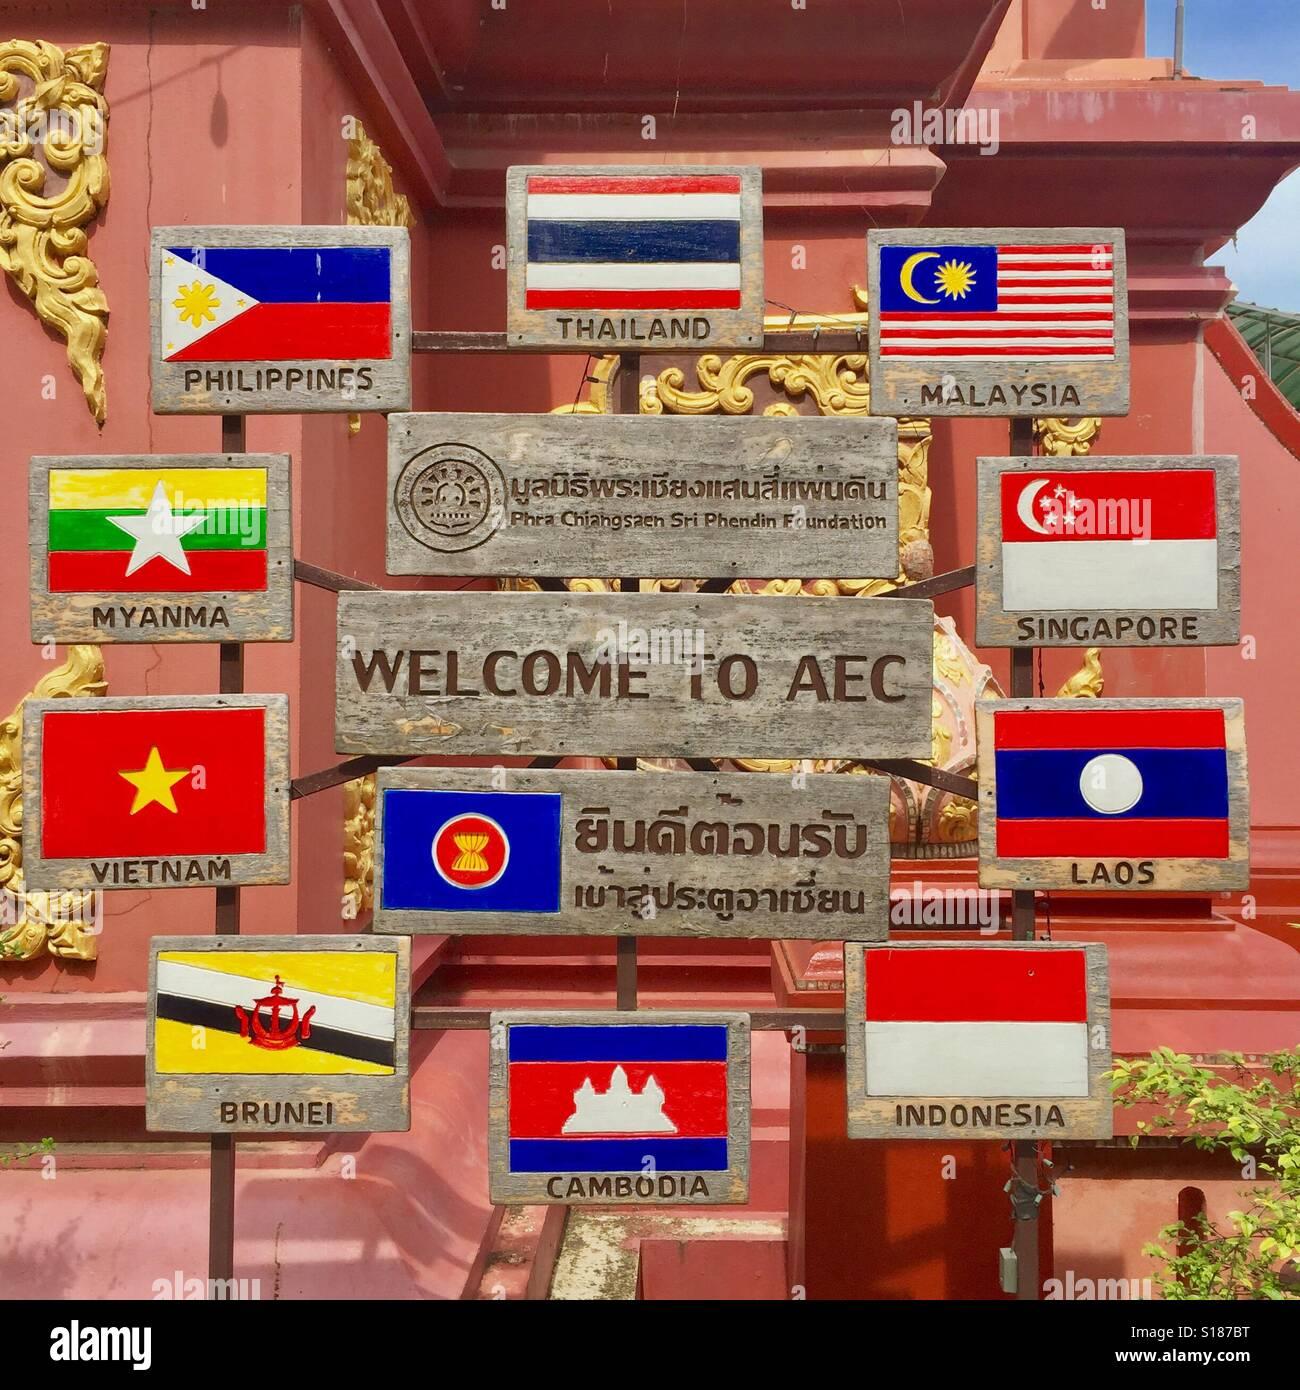 Welcome To AEC (ASEAN Economic Community) - Stock Image